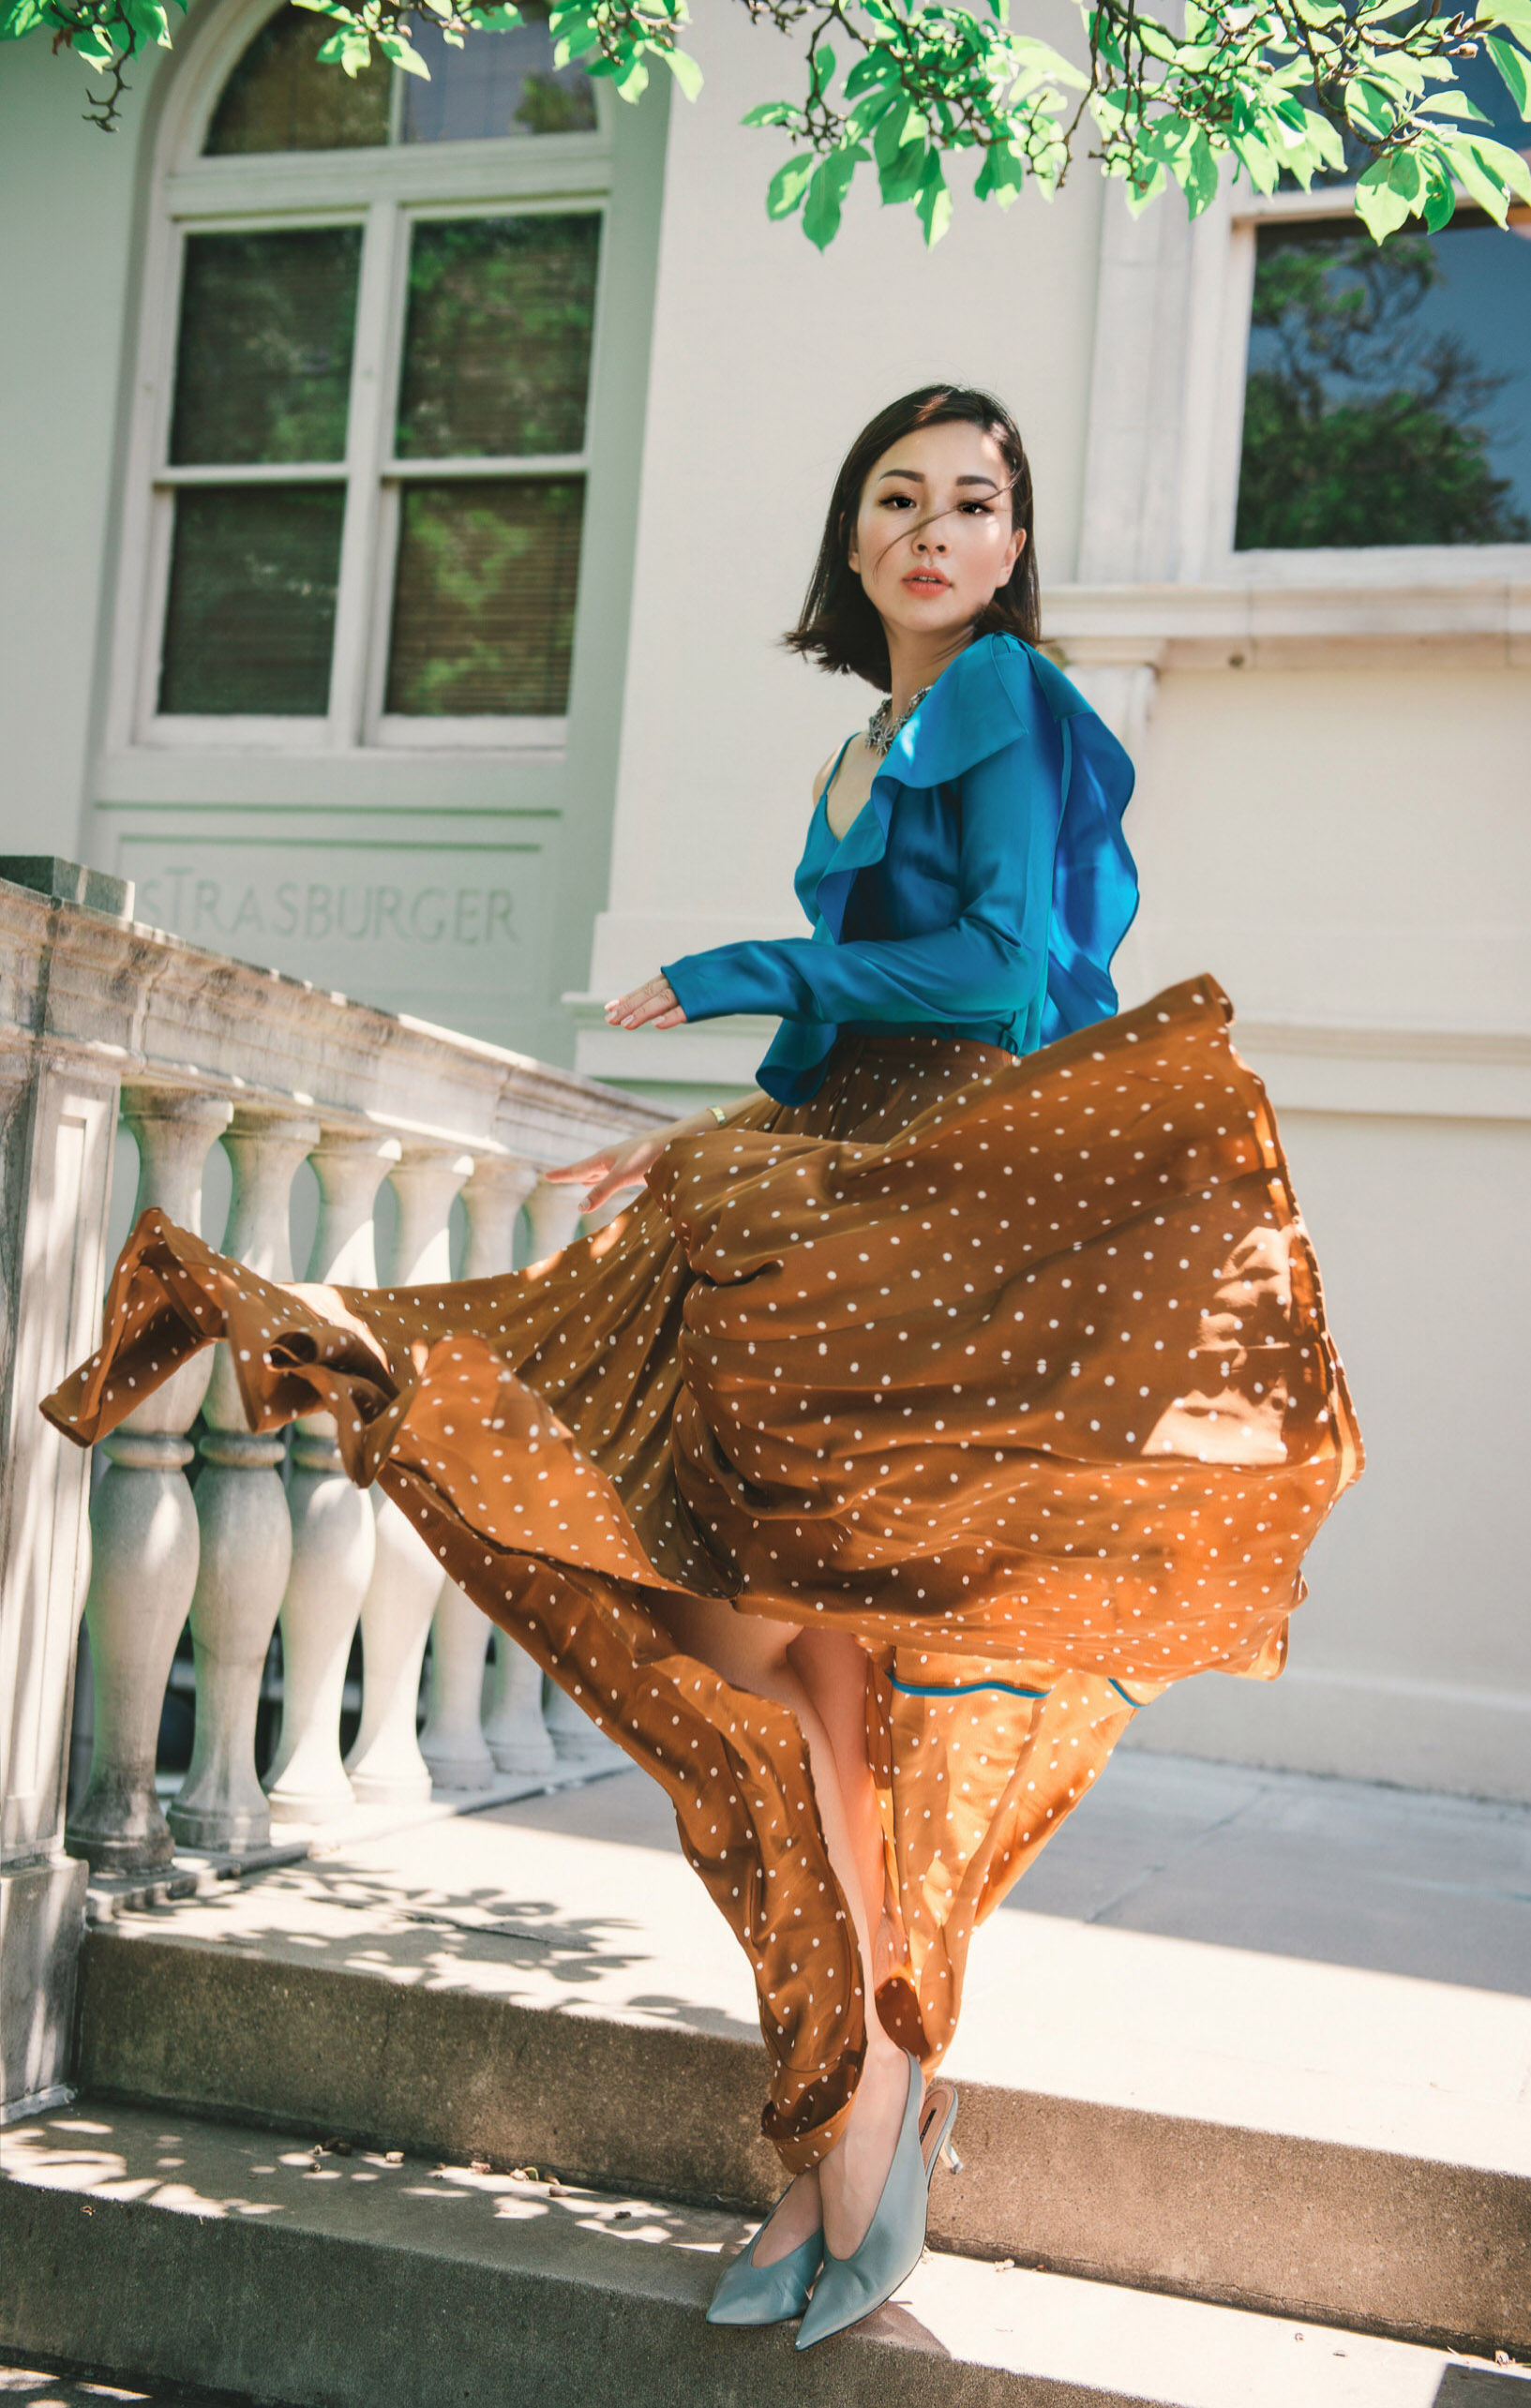 dvf skirt and top.JPG